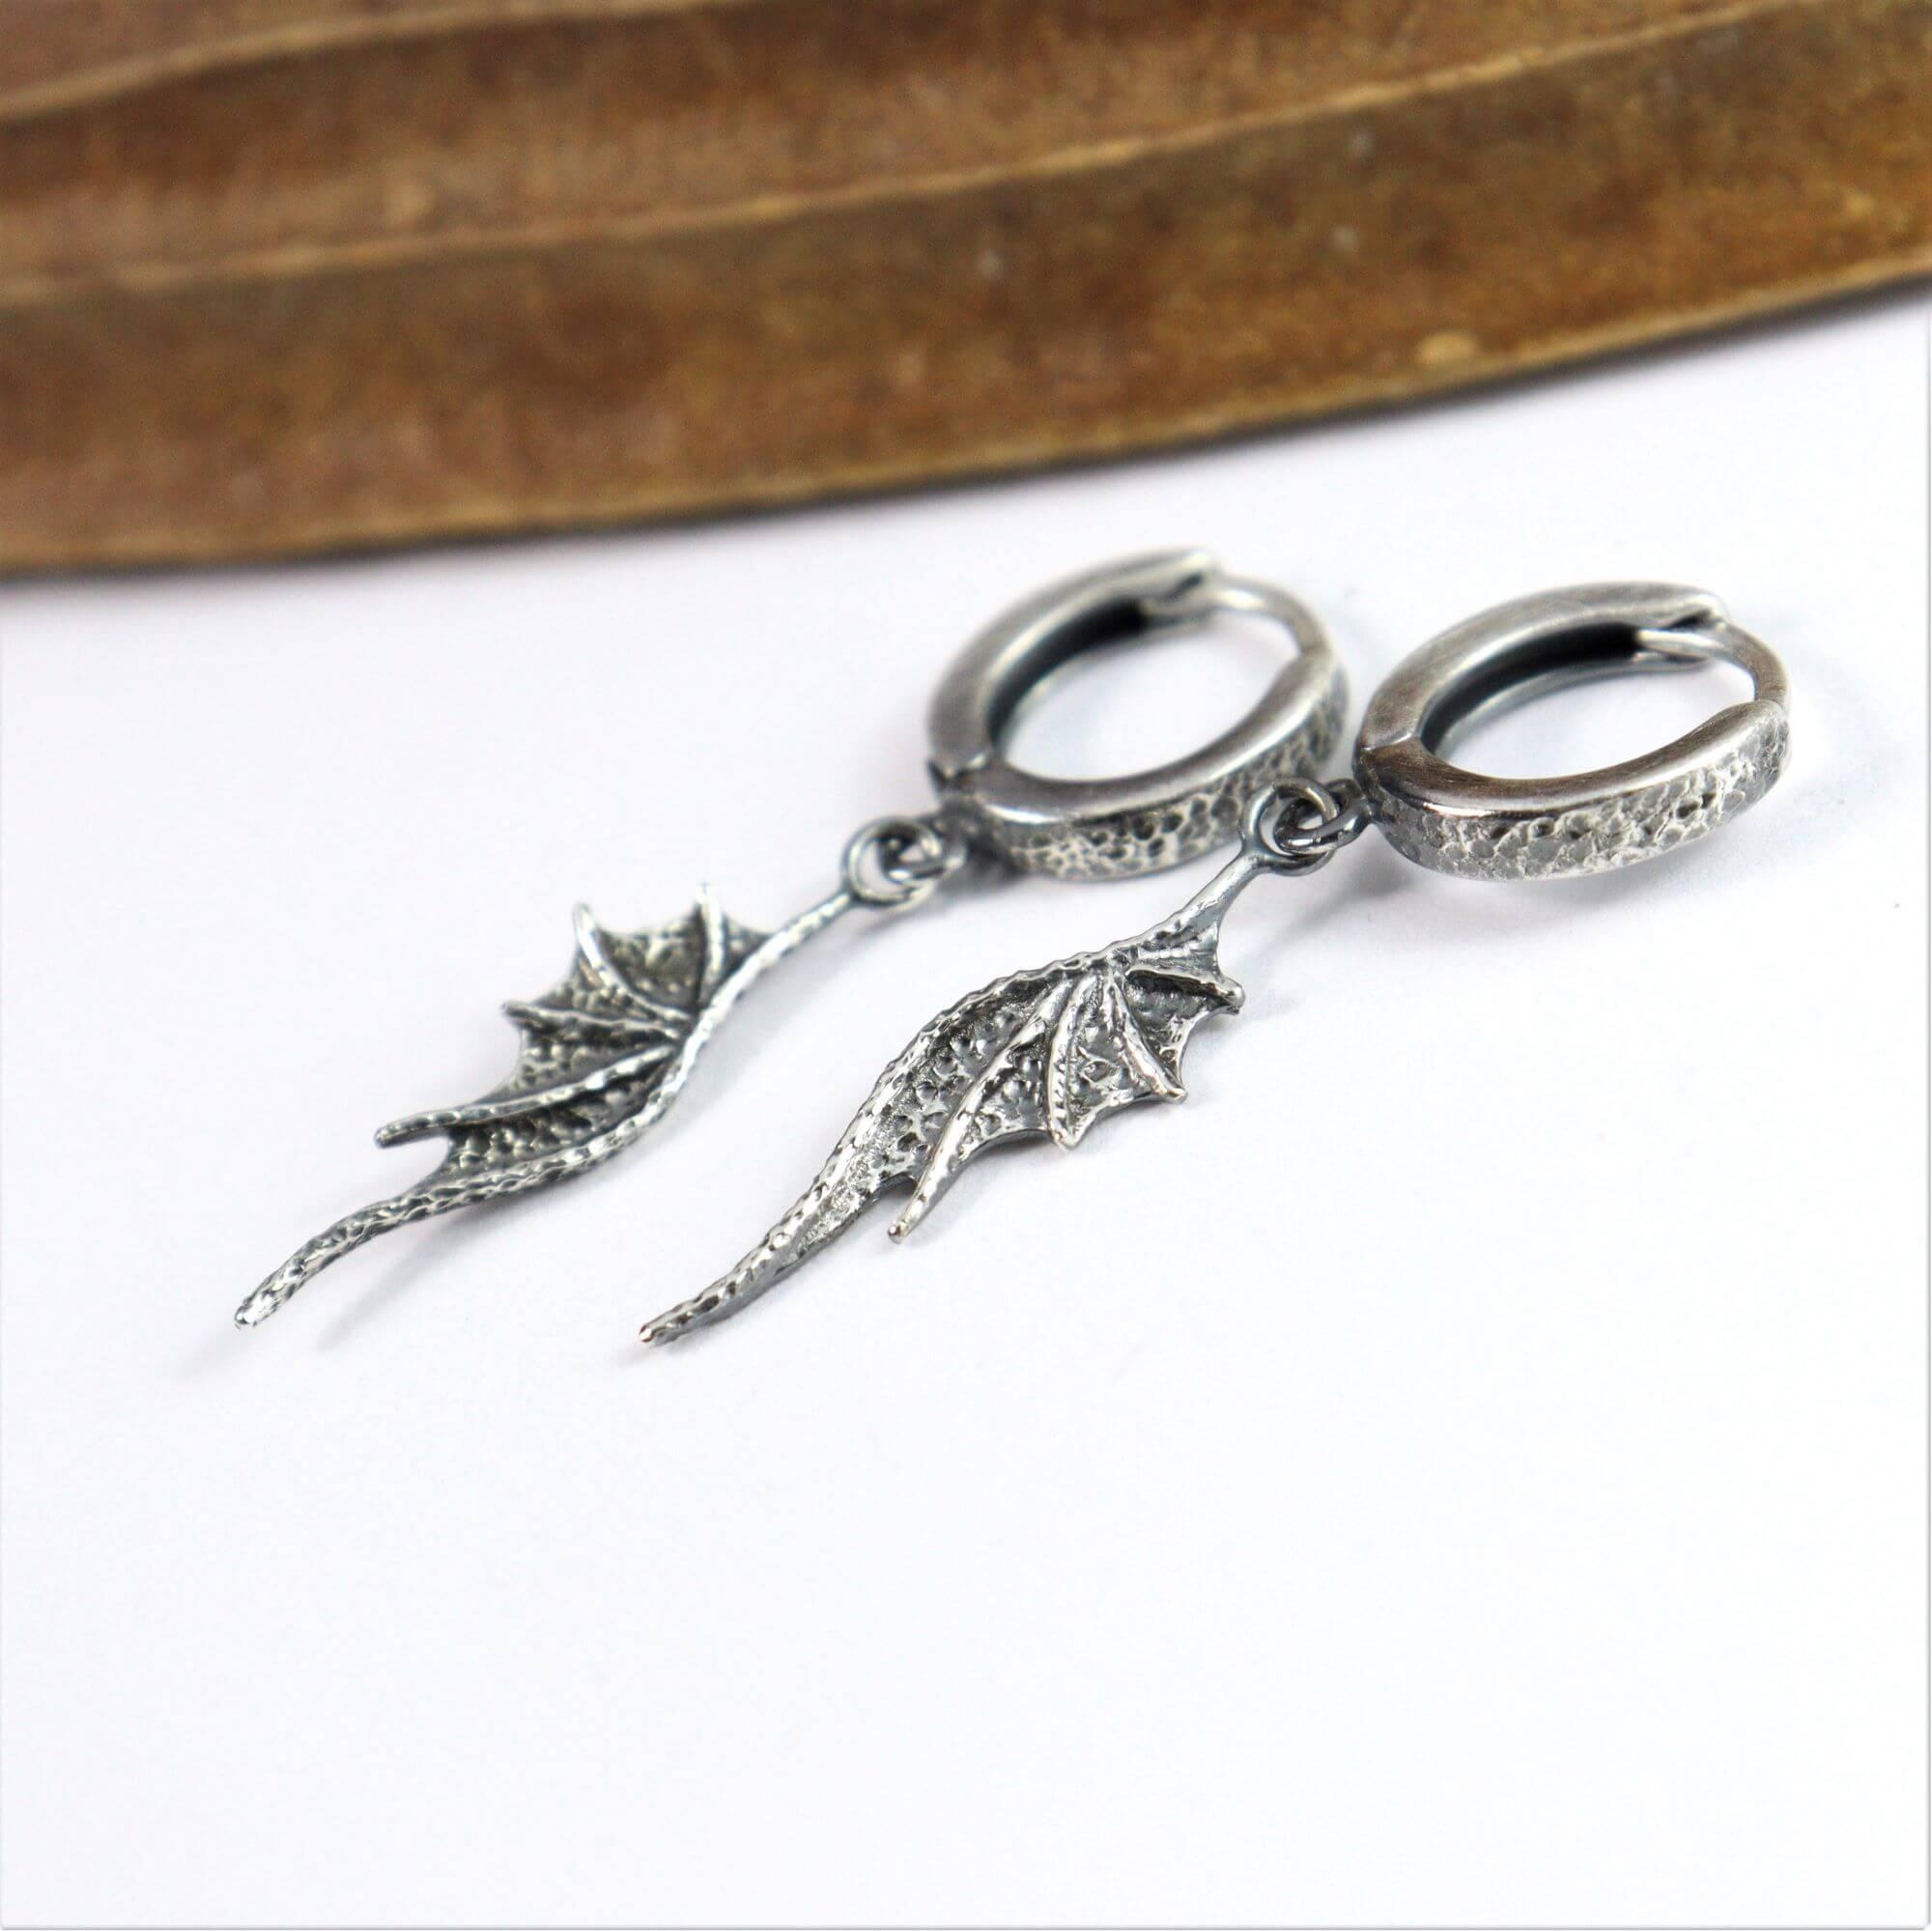 Kolczyki Long Dragon Wings Mini na biglach